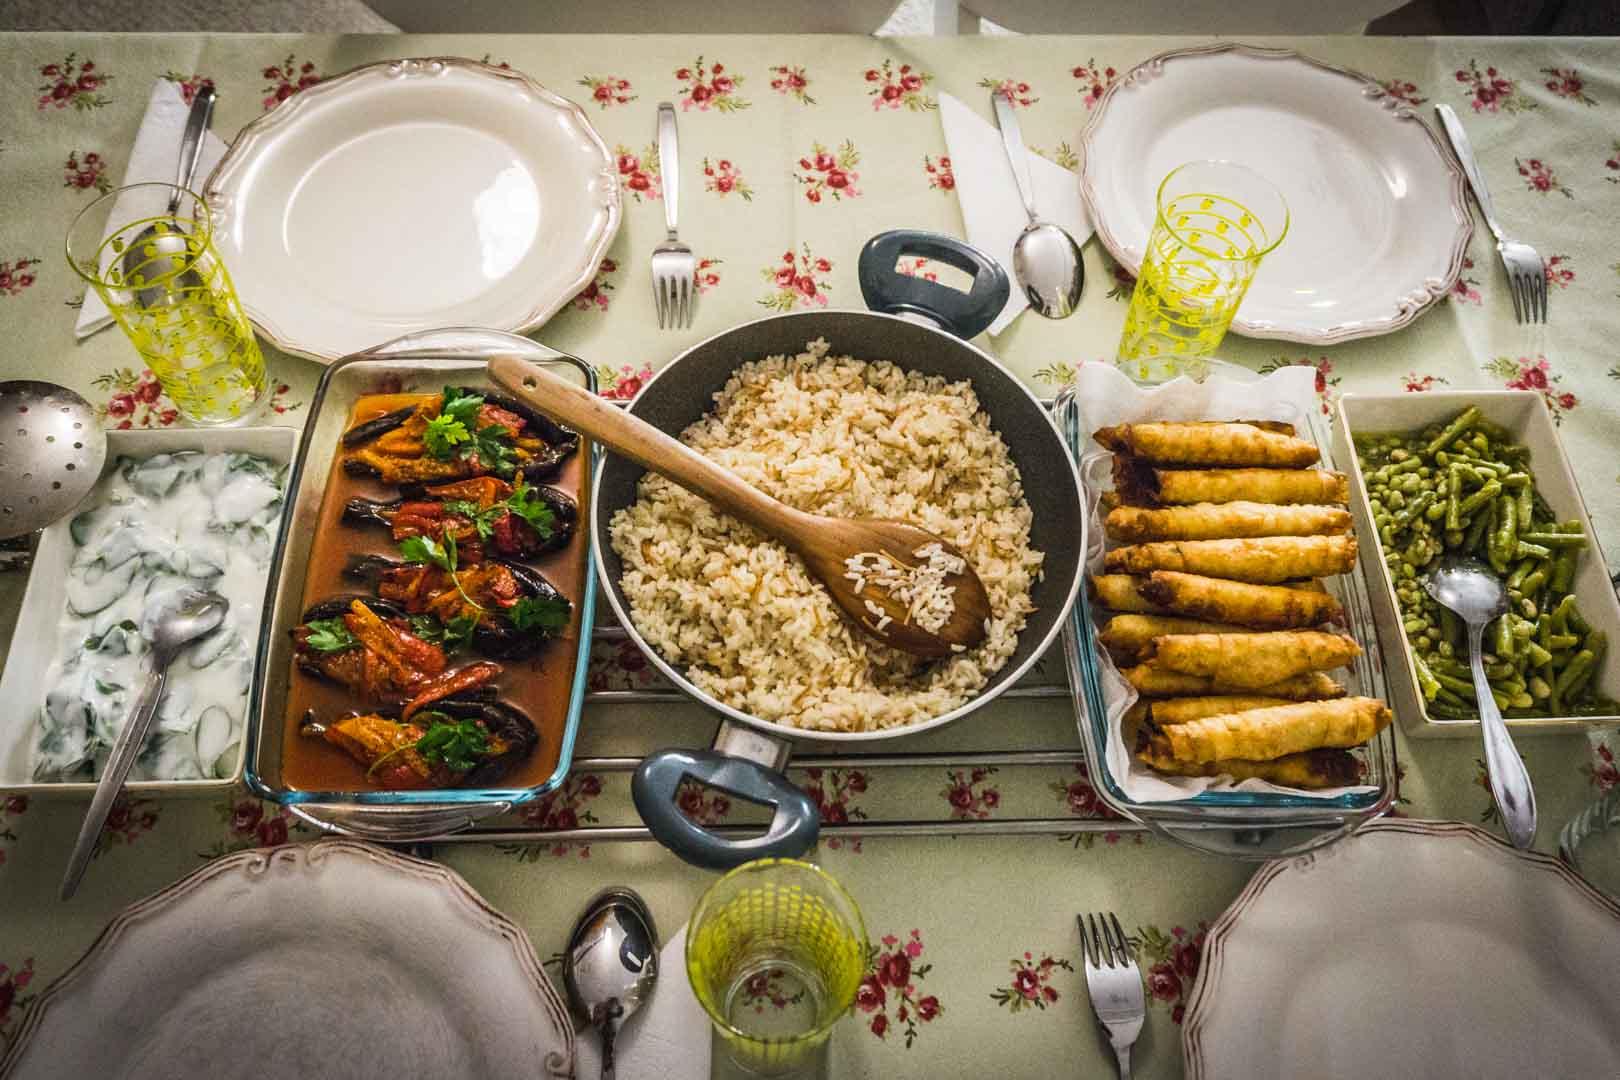 recettes turques serialhikers cook cuisine turquie turkish